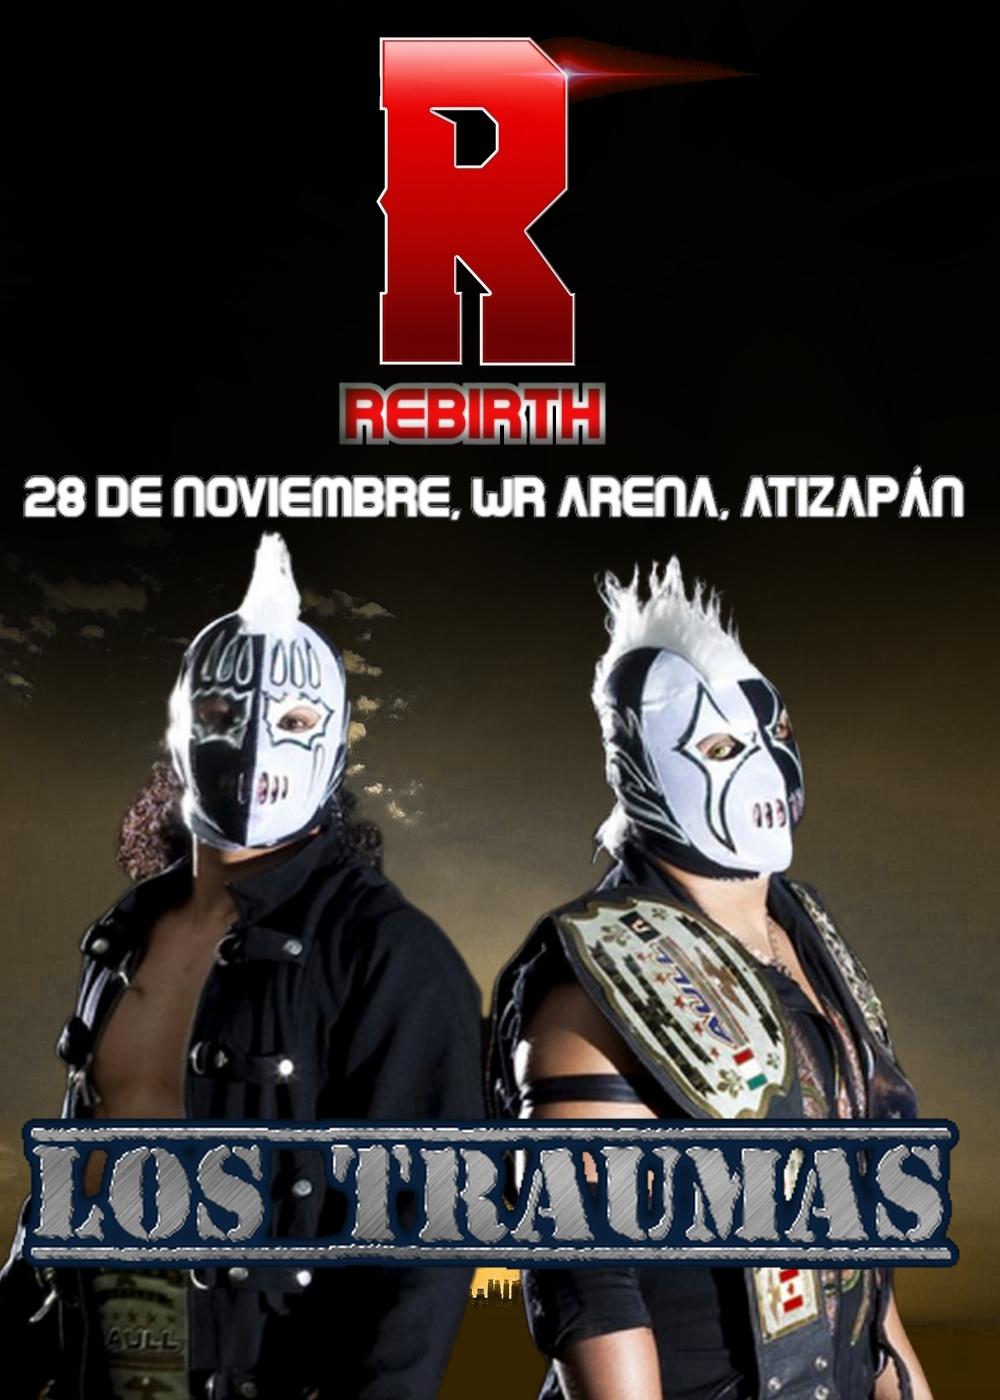 WR Arena Atizapán, WR Rebirth